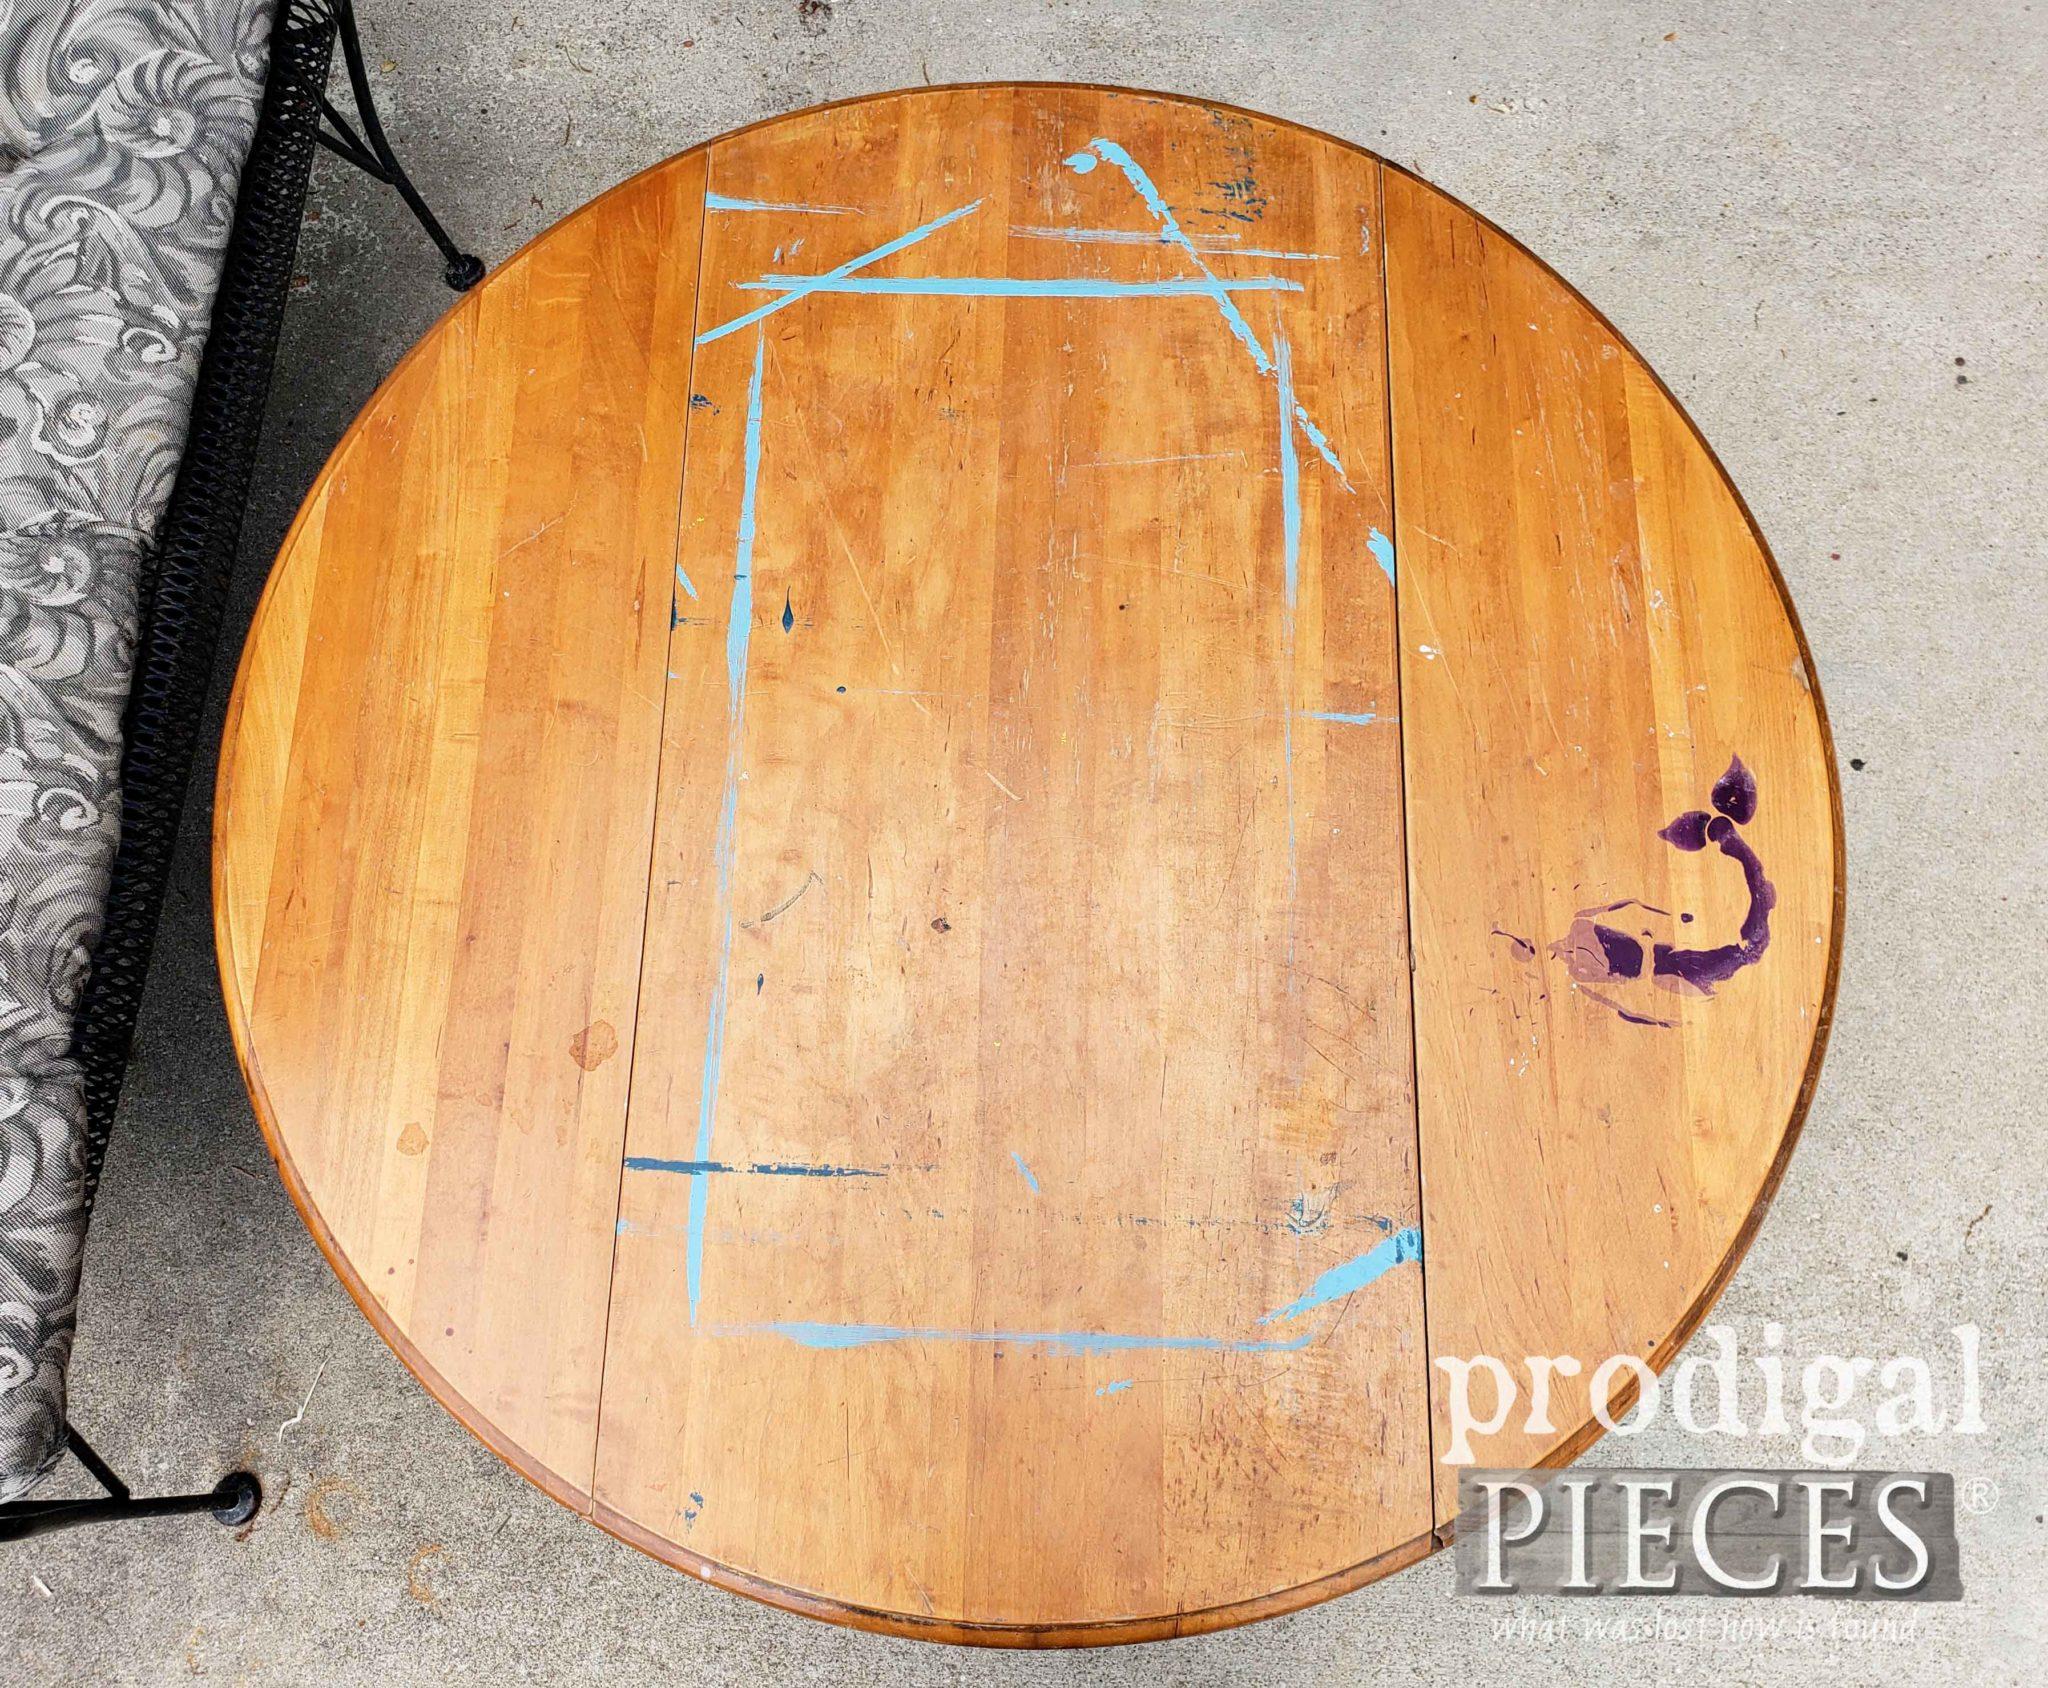 Damaged Drop-Leaf Coffee Table Top | prodigalpieces.com